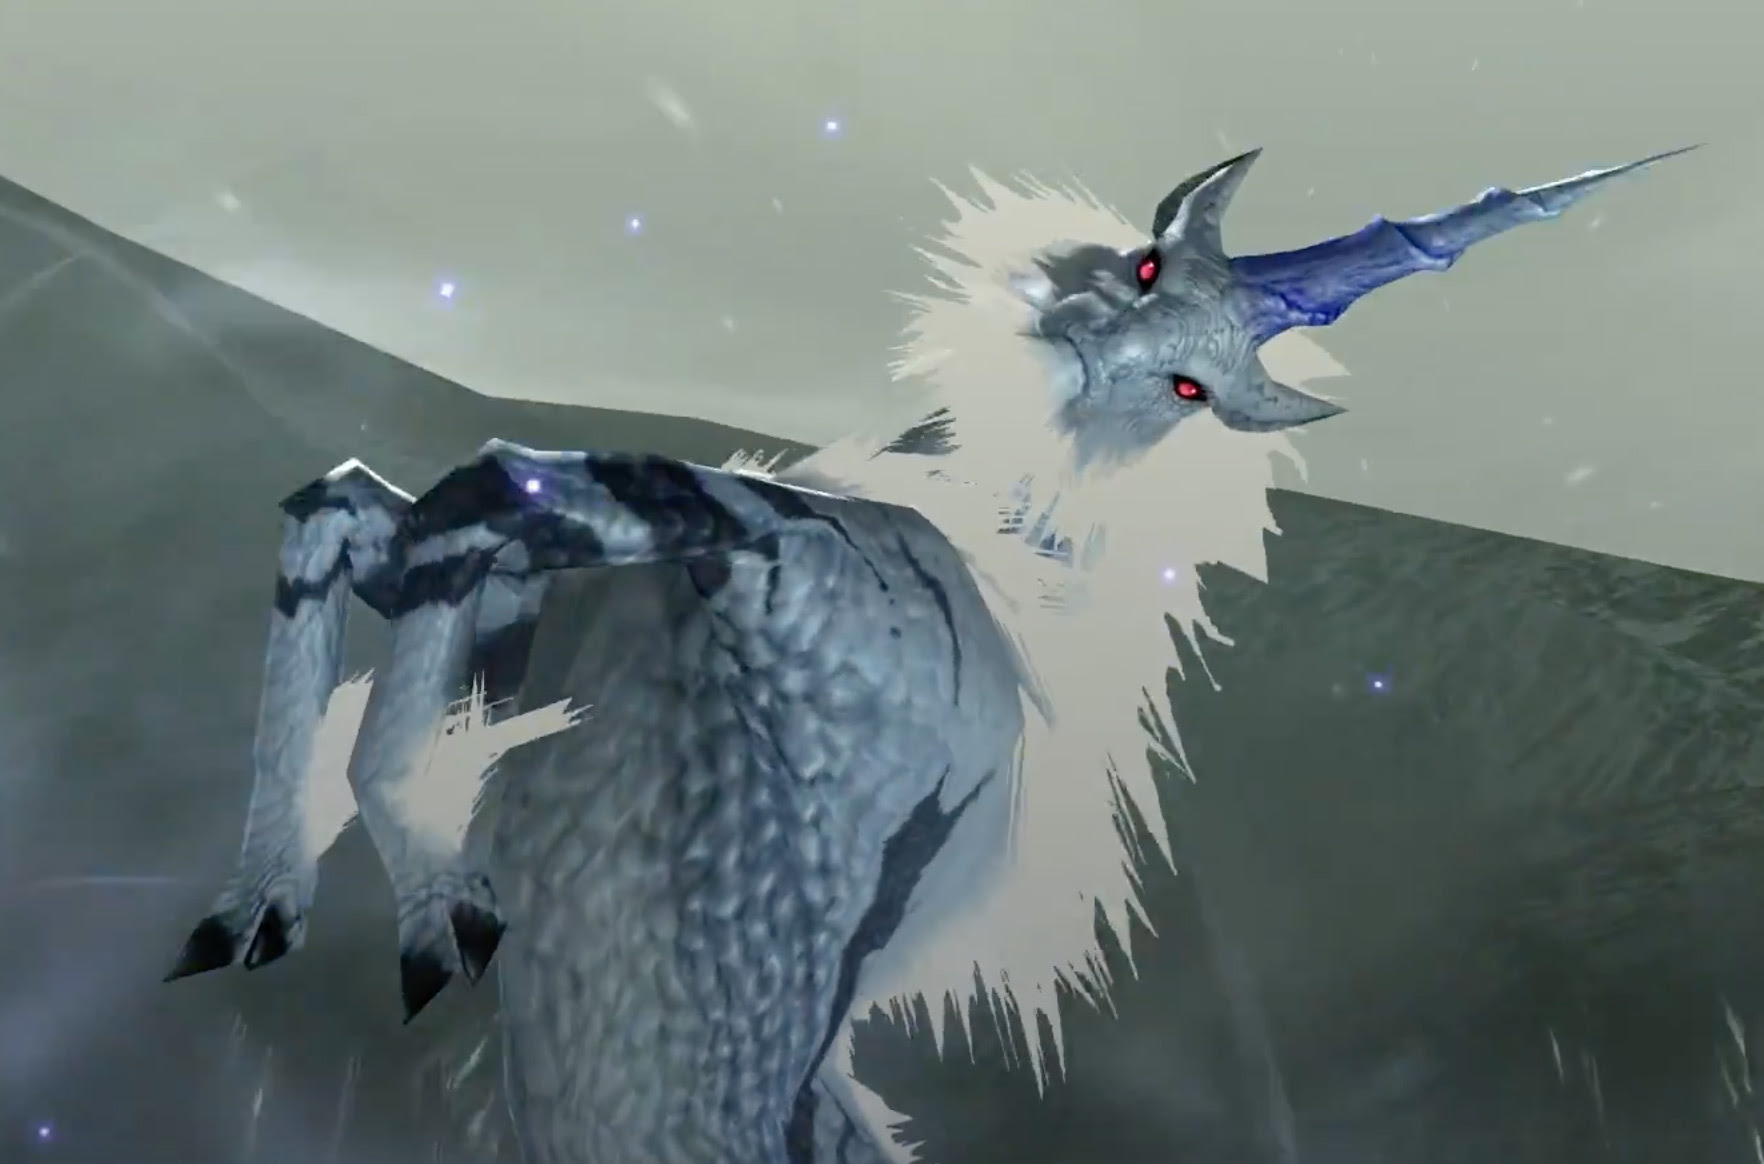 Monster Hunter XX Switch trailer drops, looks a lot like 3DS version screenshot